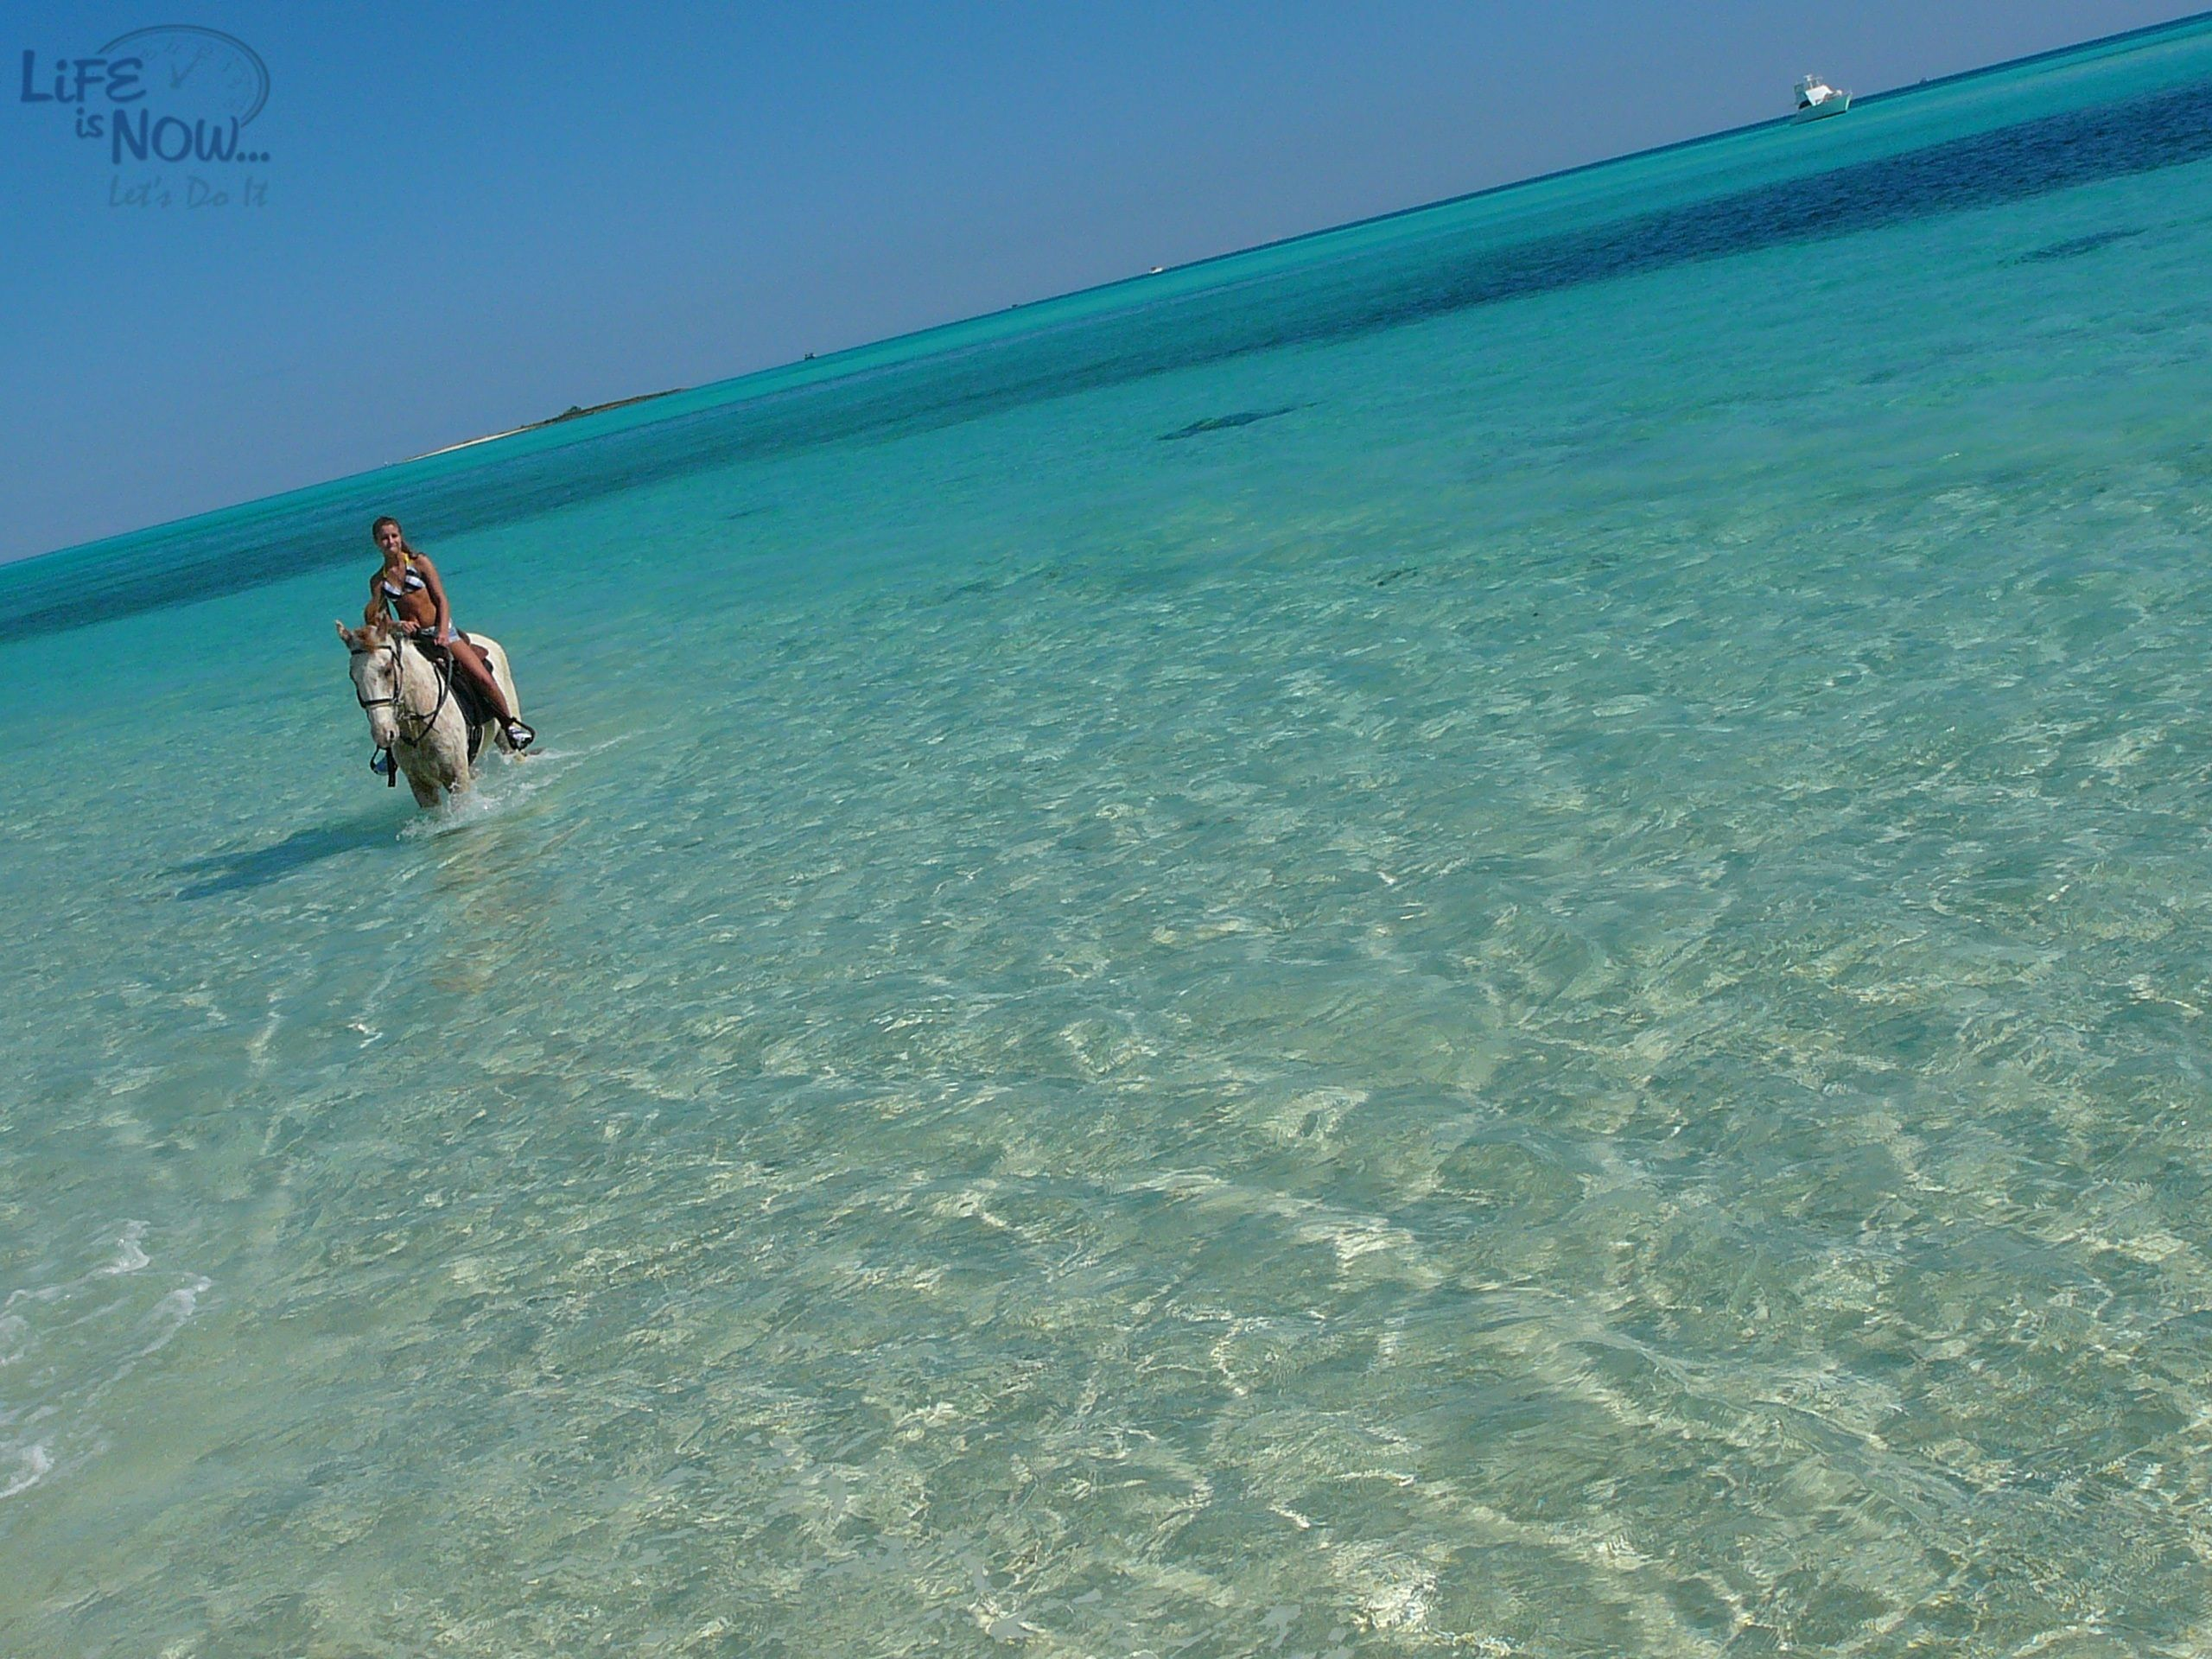 Trikk Pony Rides Bahamas Horseback riding, Beach